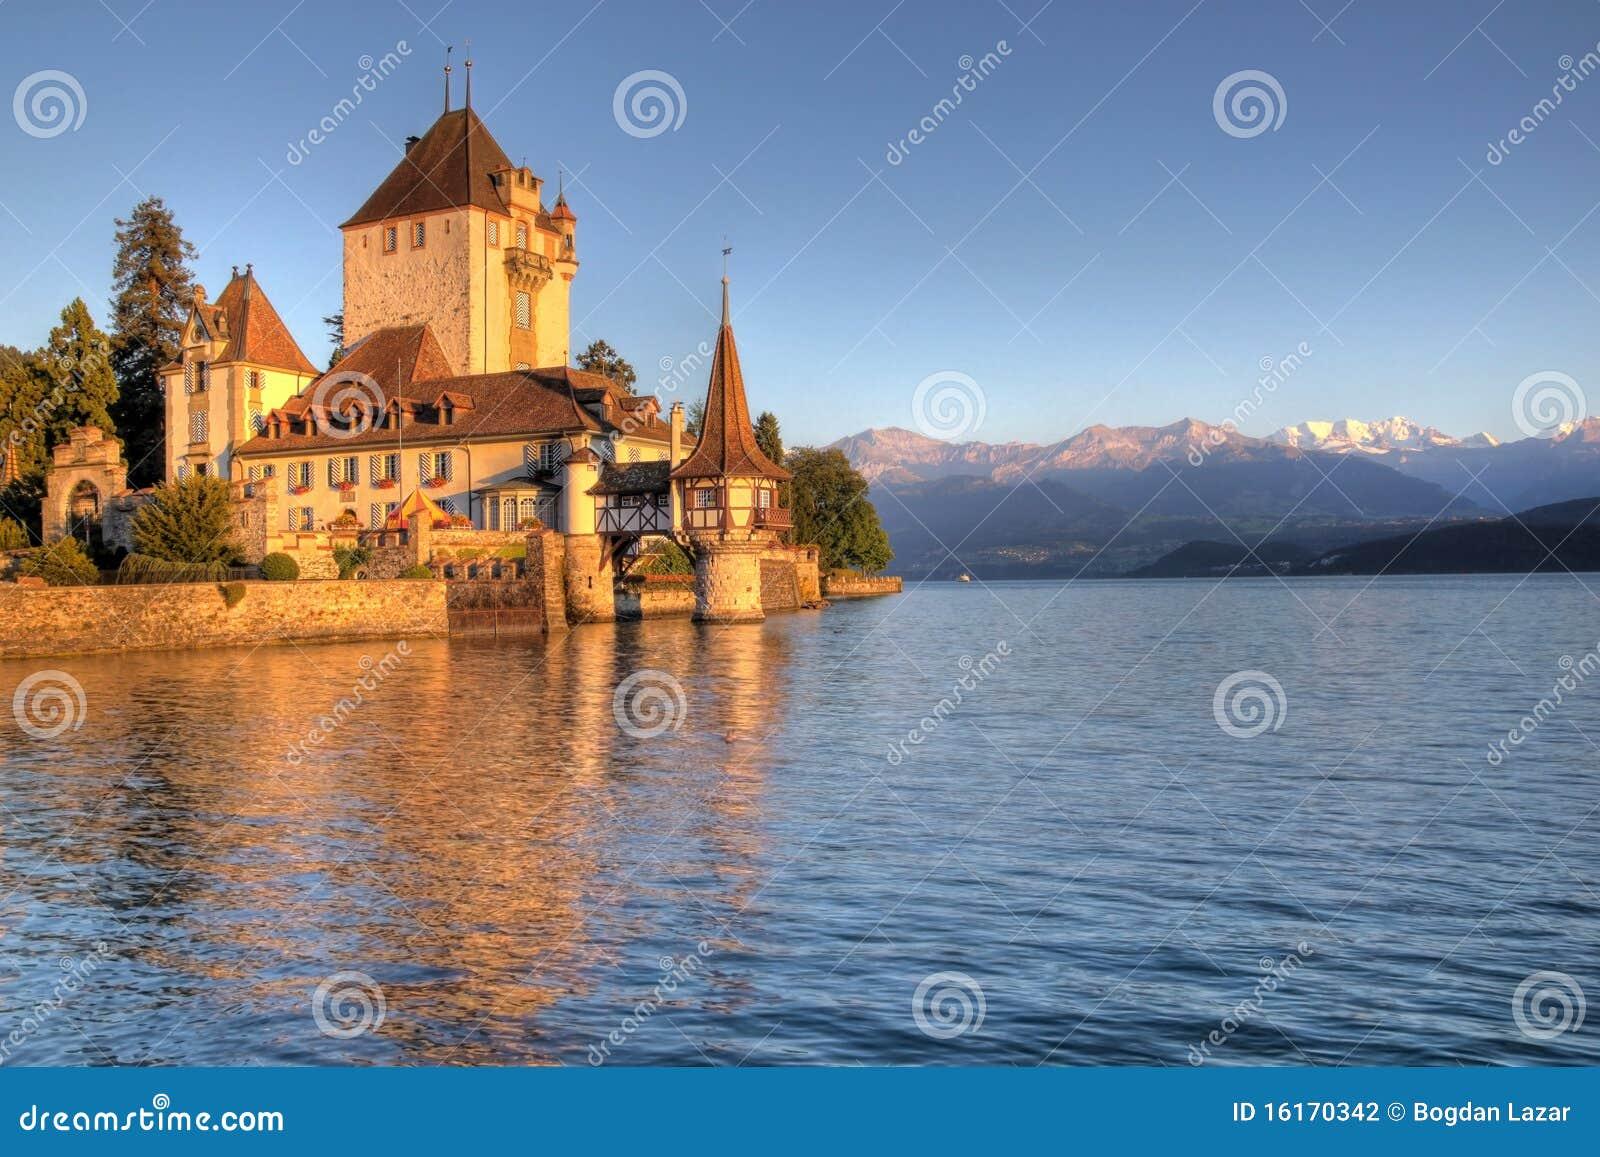 Schloss Oberhofen sul lago Thun, Svizzera